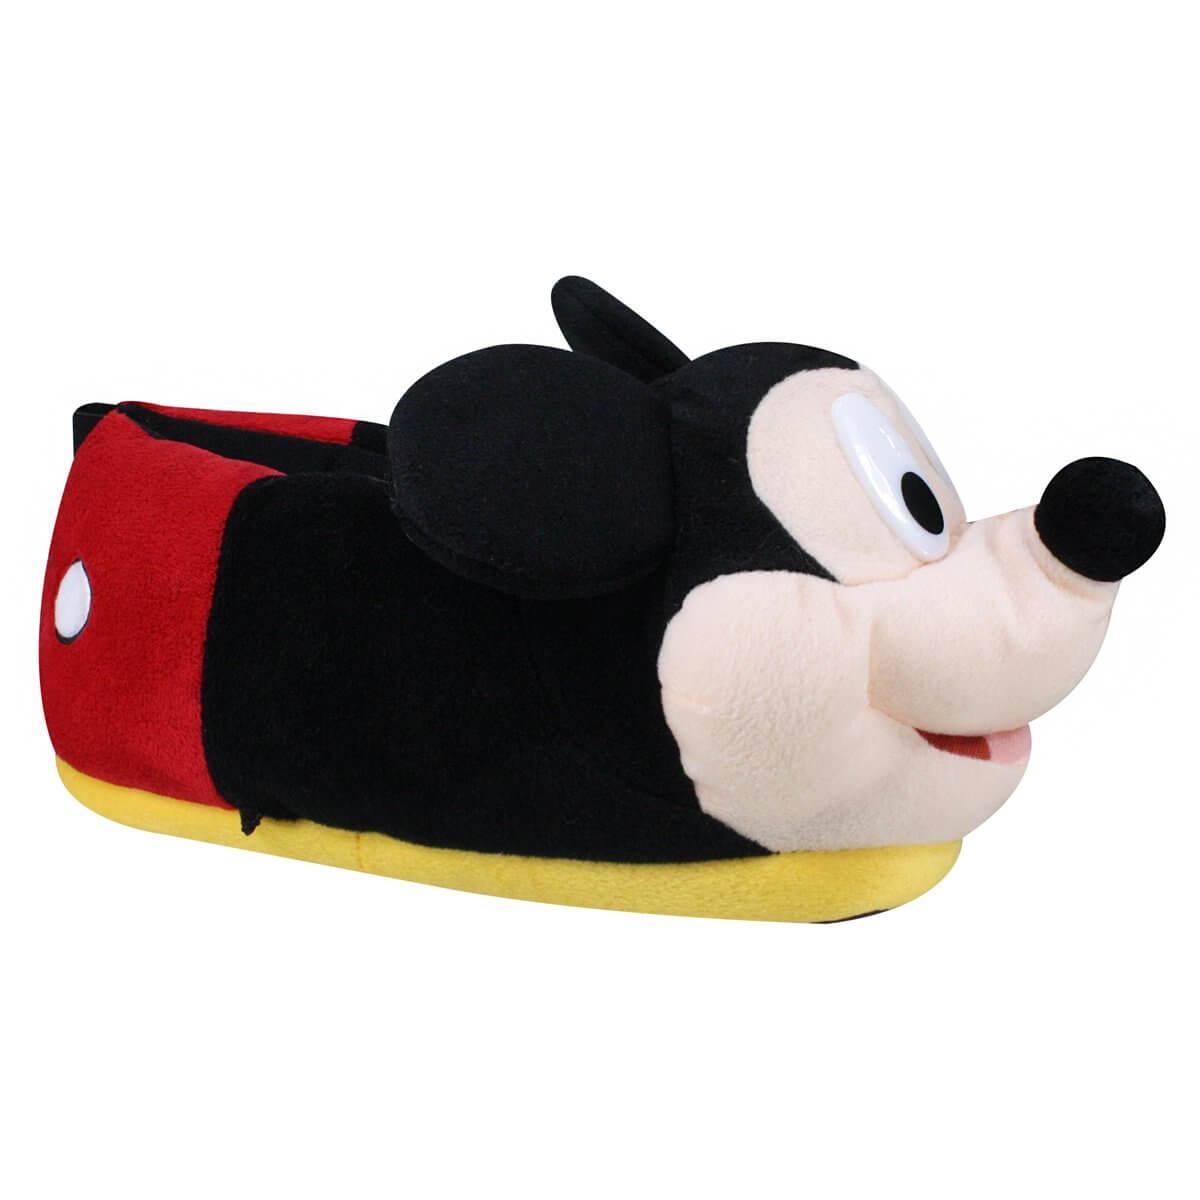 032c82eecab Pantufa Infantil Ricsen Mickey